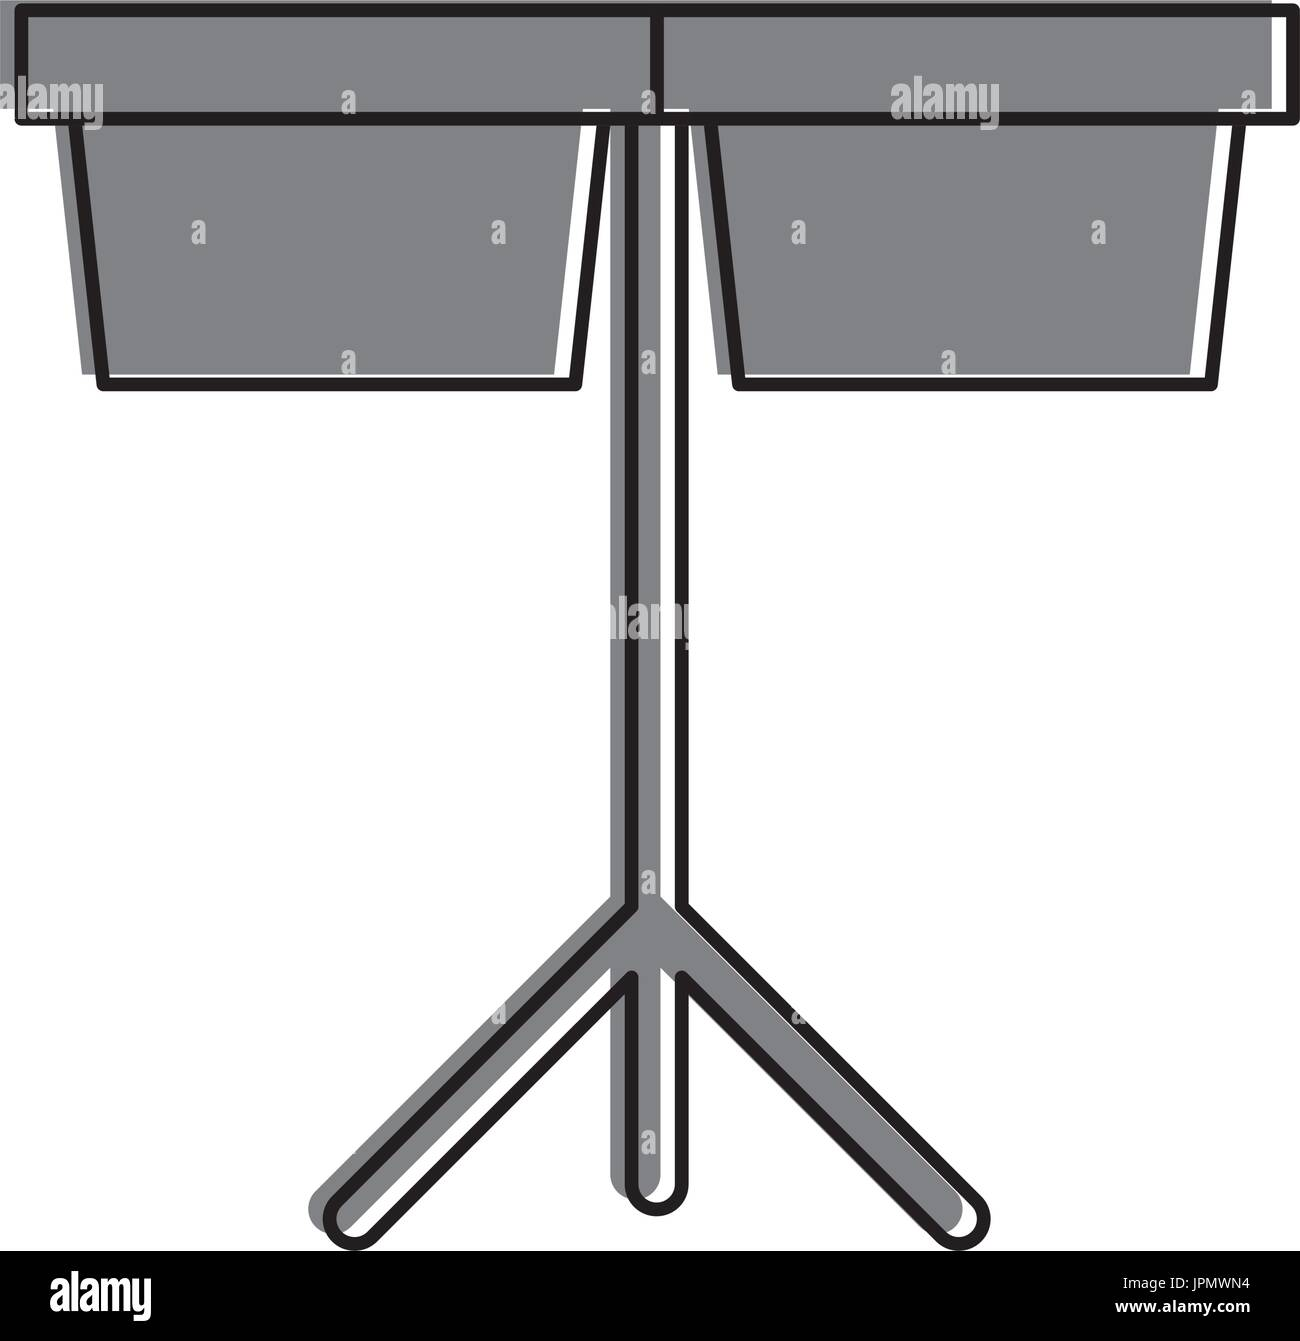 timpani music instrument icon